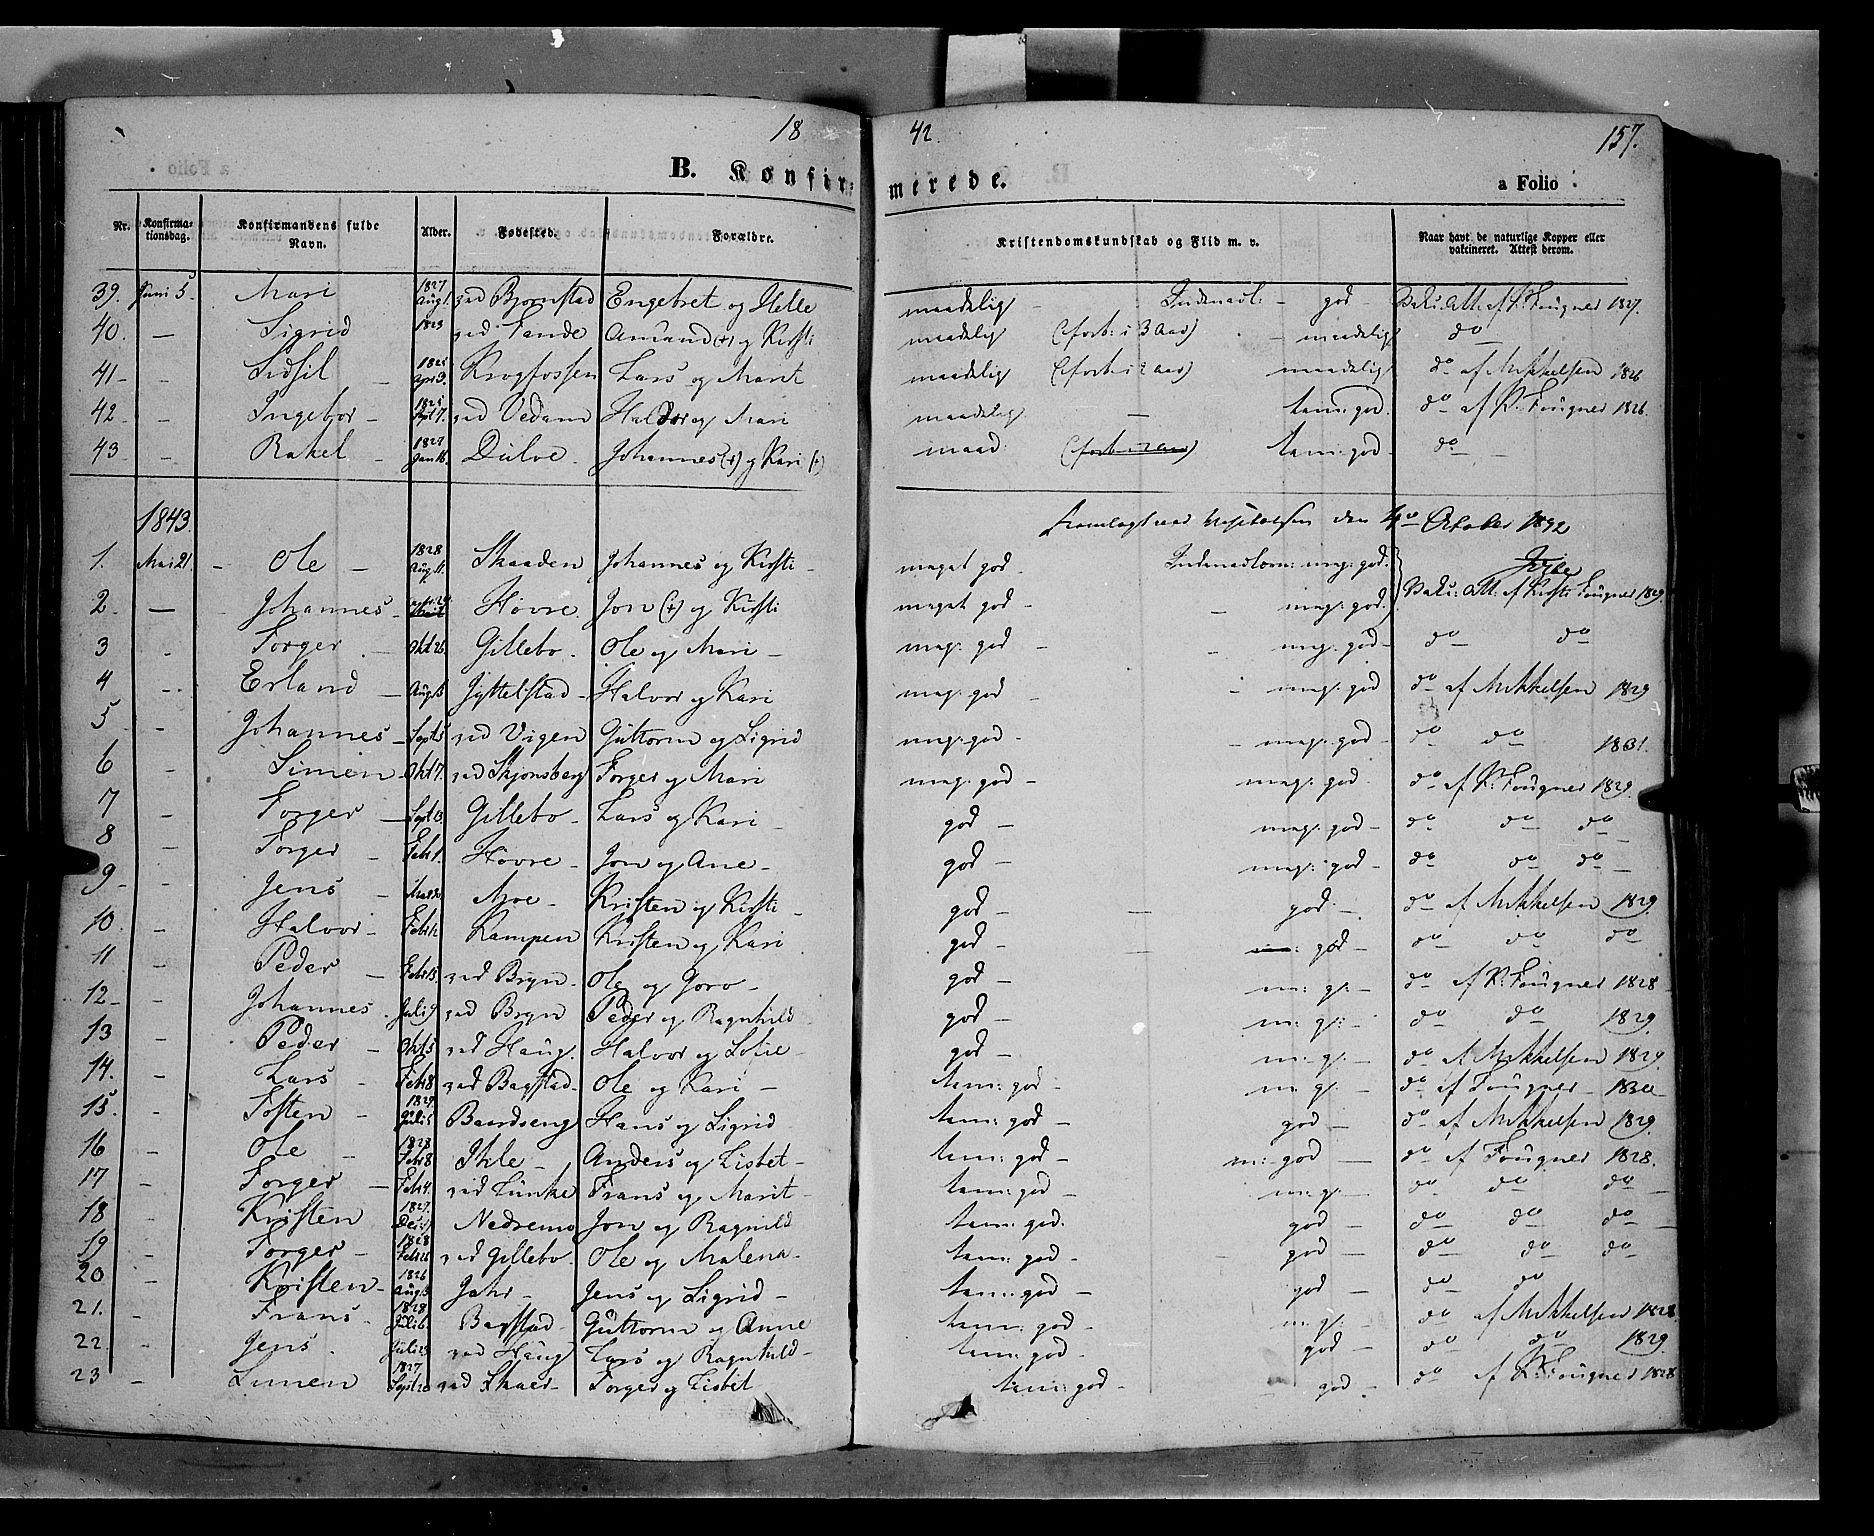 SAH, Øyer prestekontor, Ministerialbok nr. 5, 1842-1857, s. 157